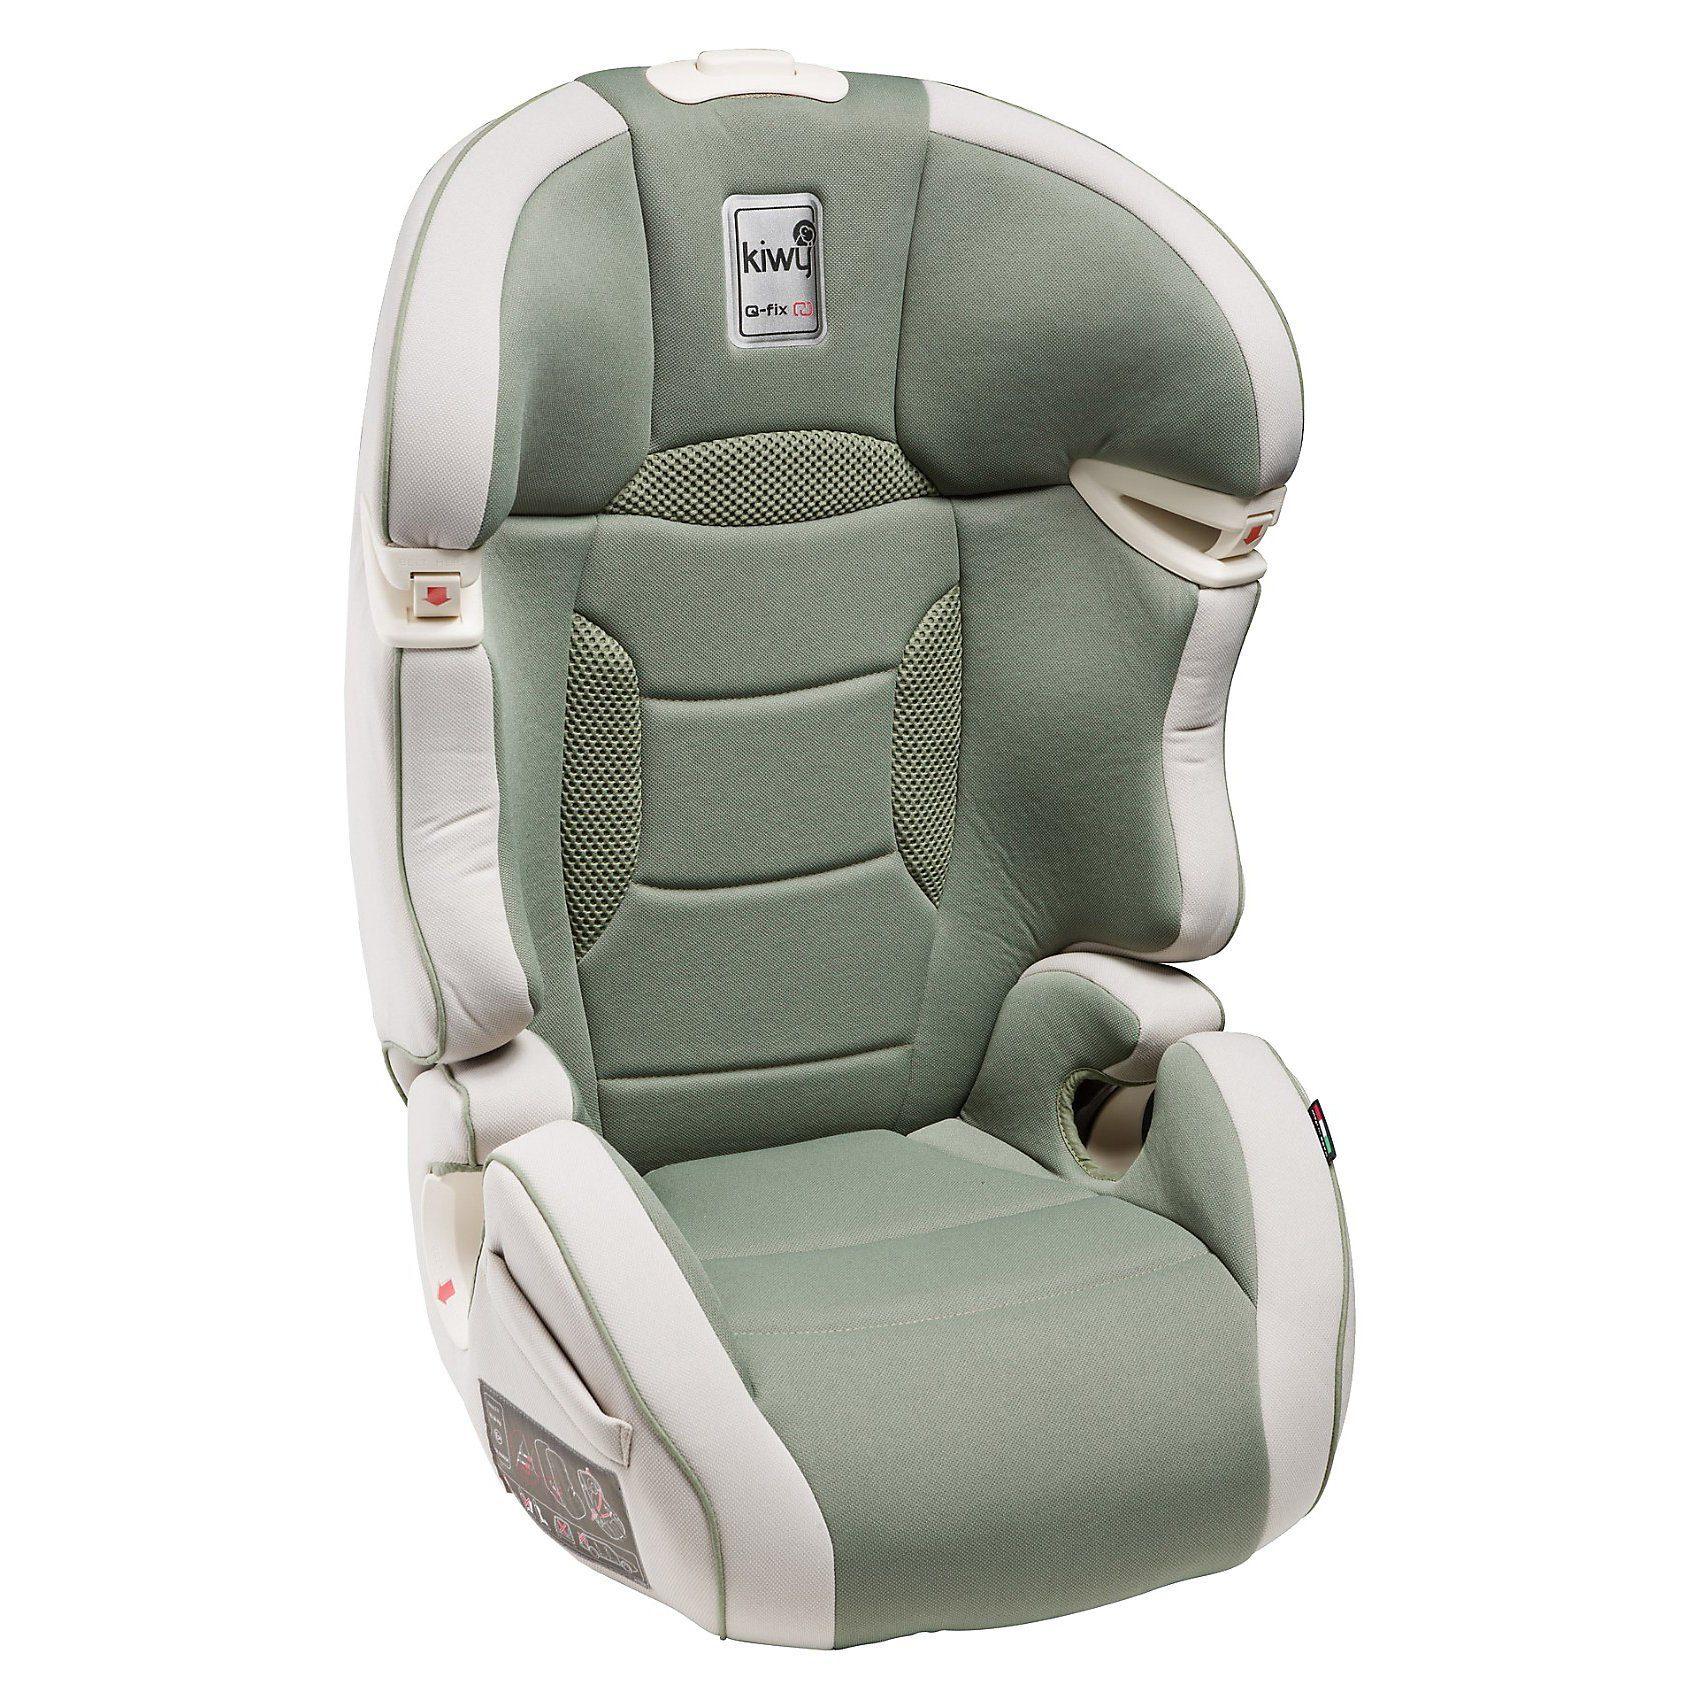 Kiwy Auto-Kindersitz SLF23 Q-Fix, Aloe, 2017